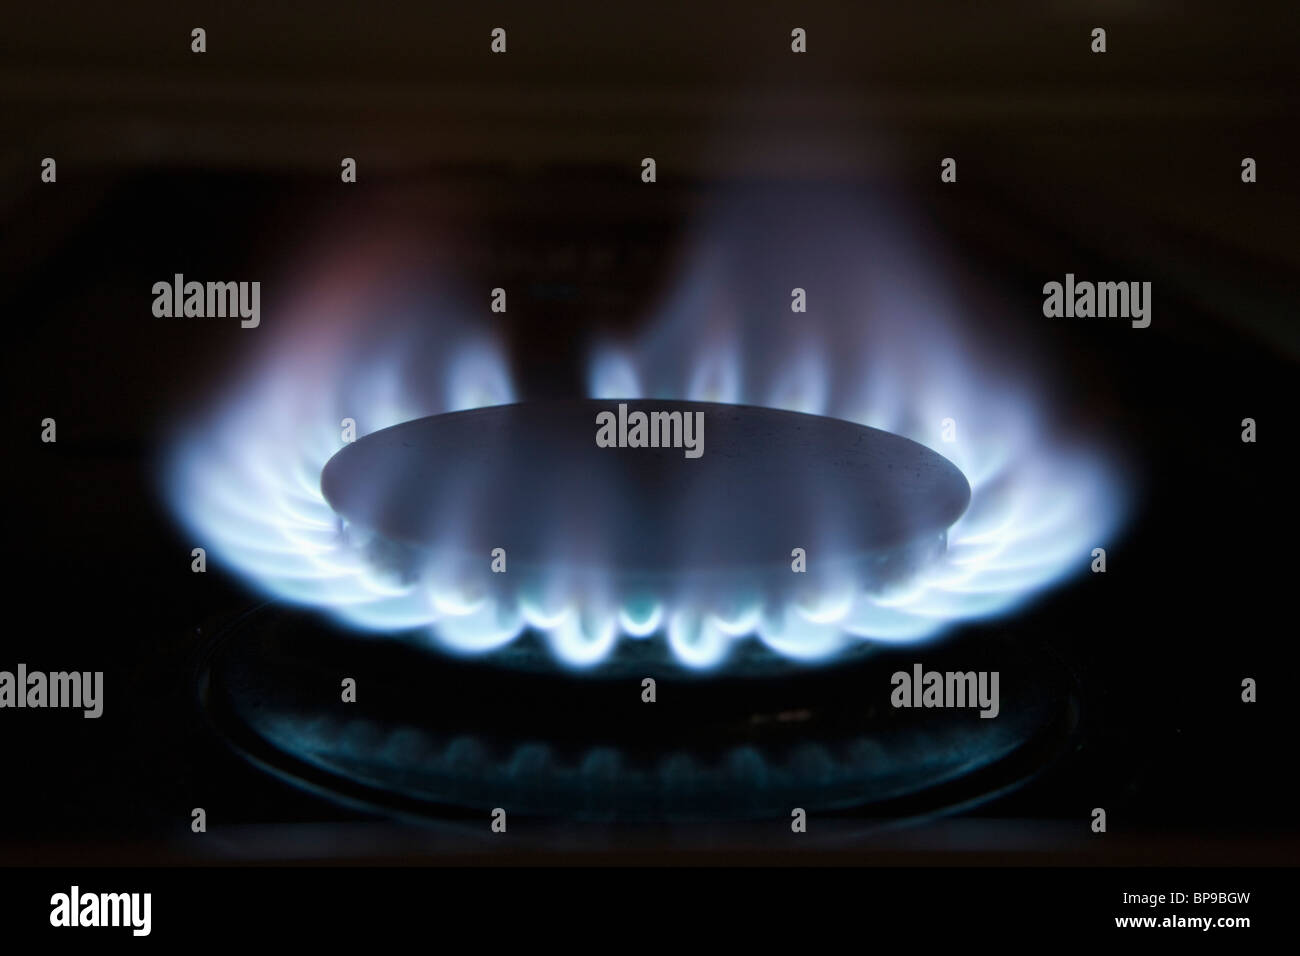 Gasbrenner mit blauen Flammen Stockbild